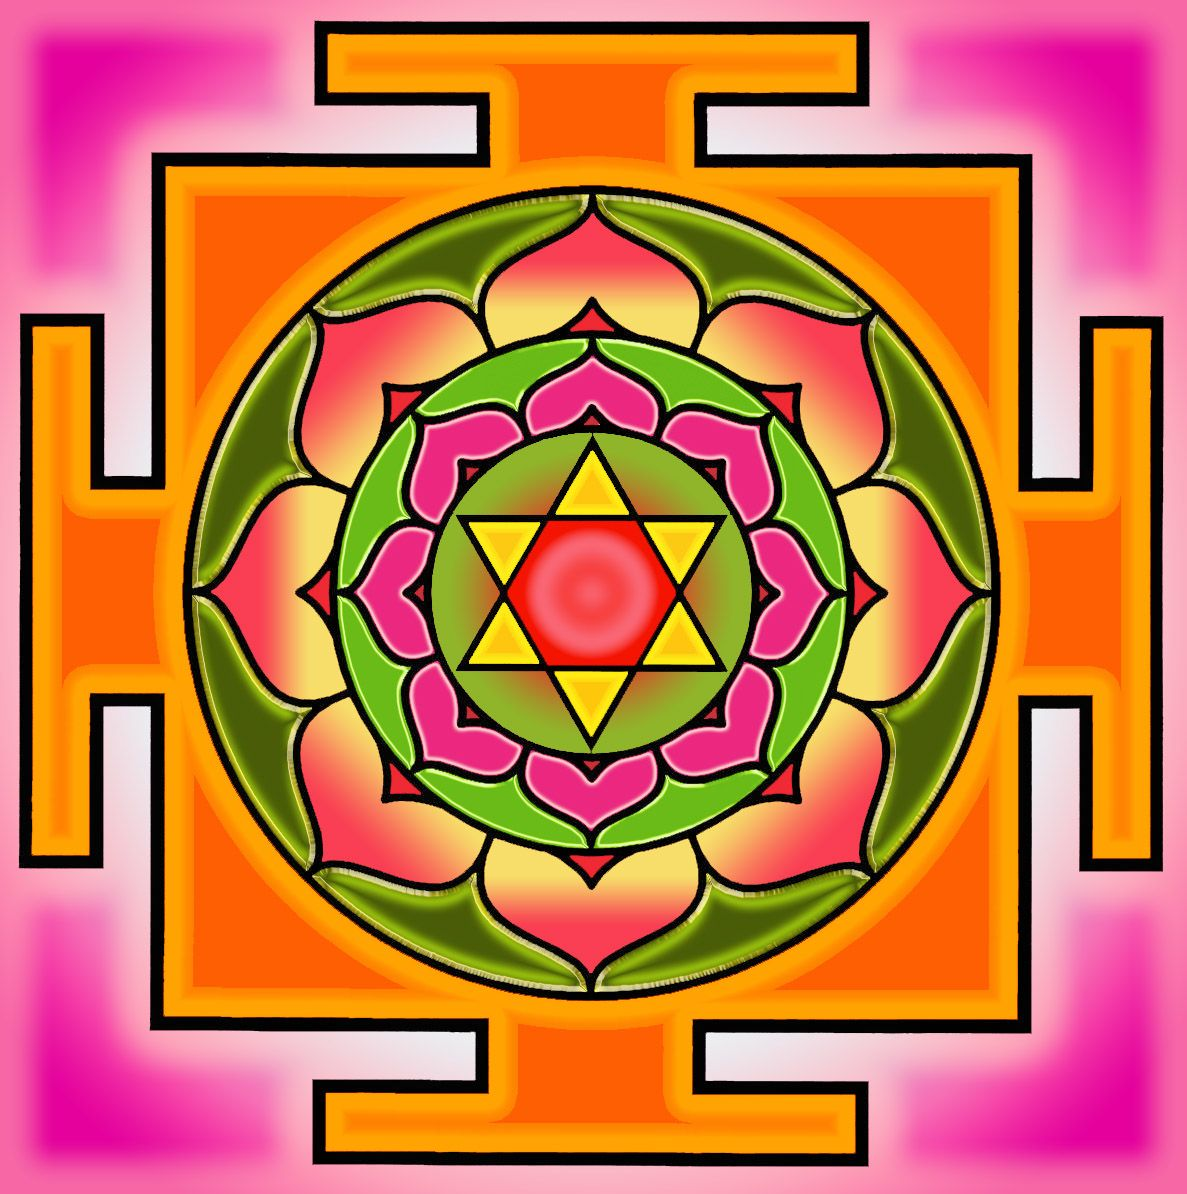 essay on diwali festival in sanskrit language